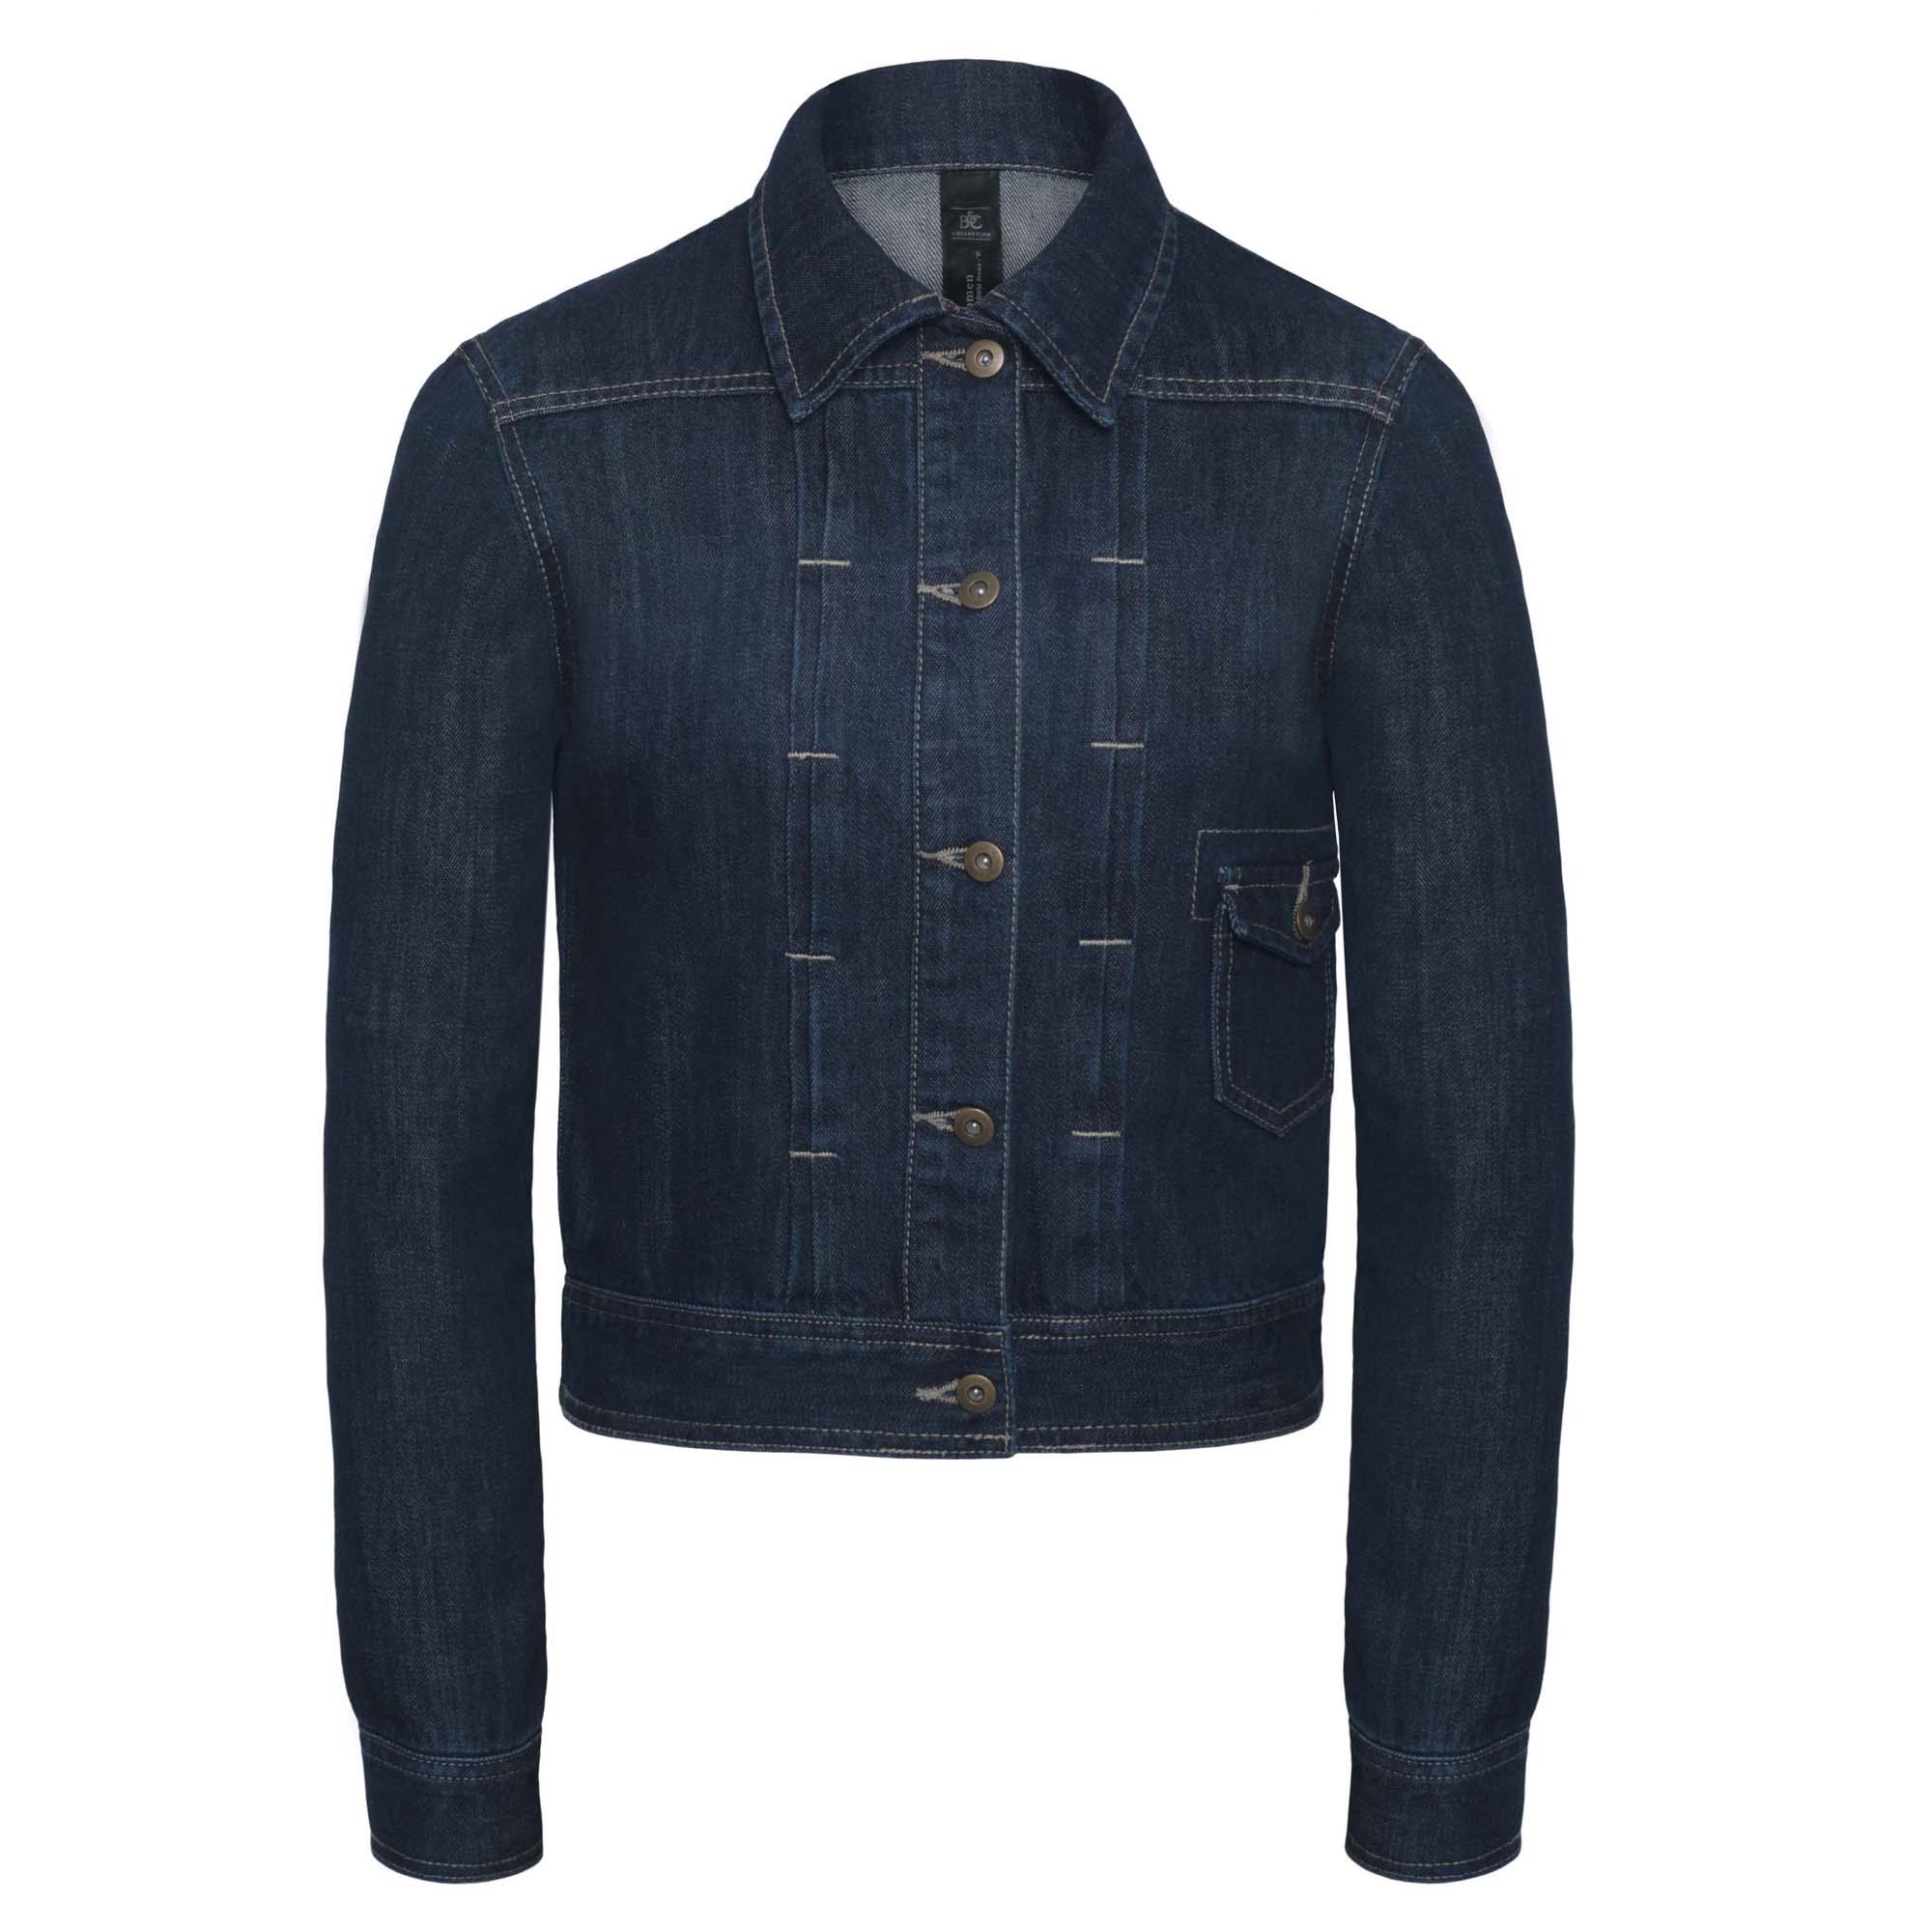 B&C Denim Womens/Ladies Frame Denim Trucker Jacket (2XL) (Deep Blue Denim)